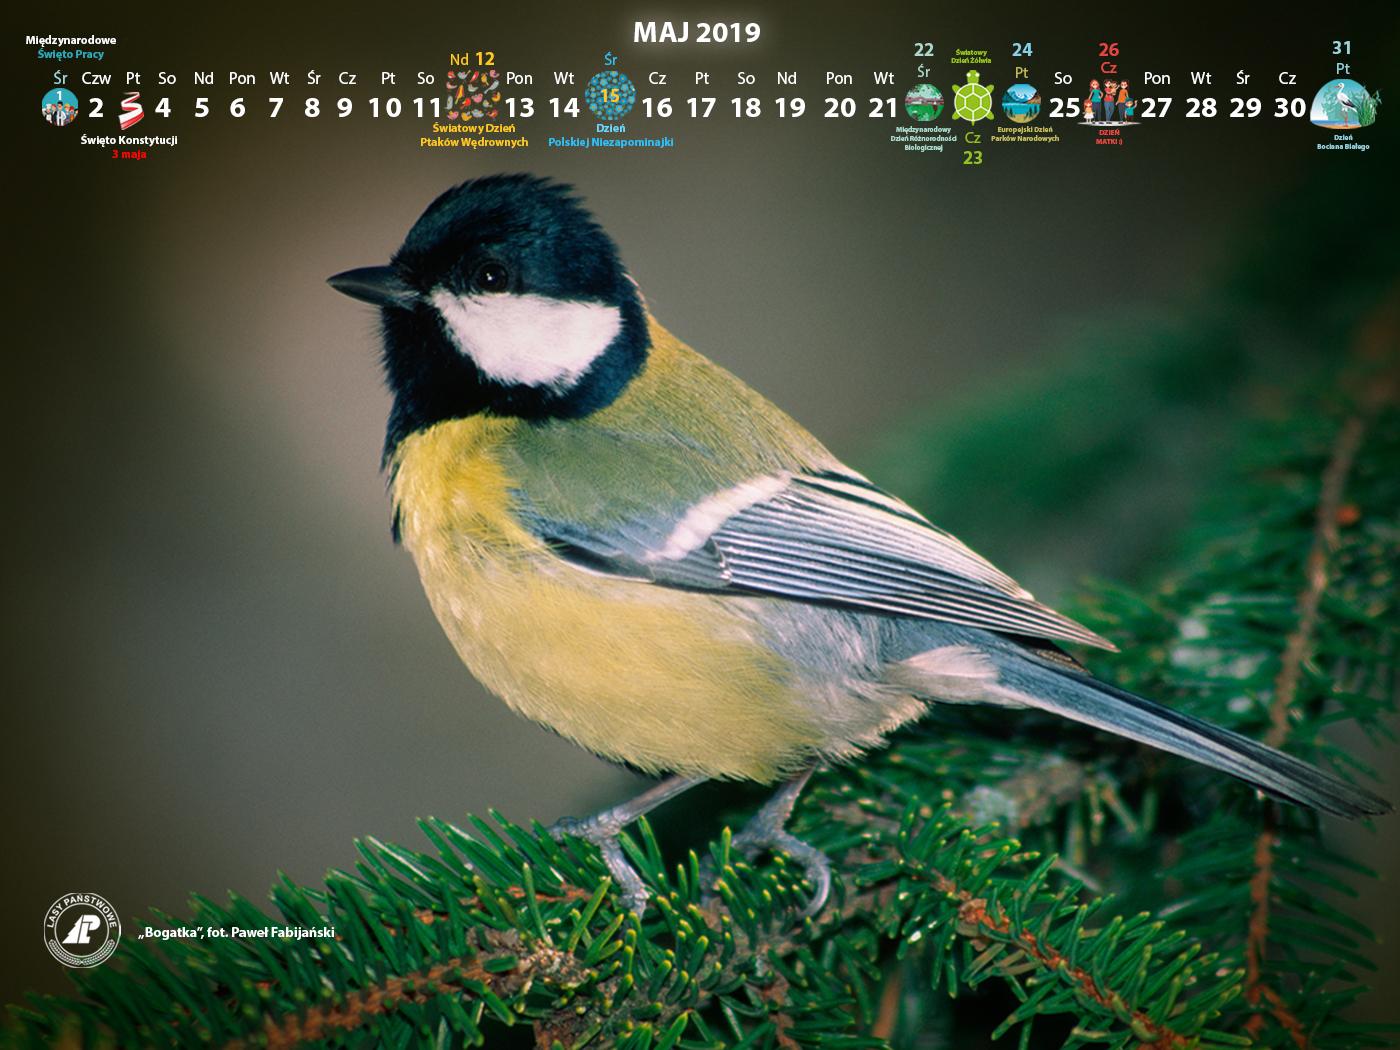 Kalendarz_maj_2019_1400x1050[1].jpg